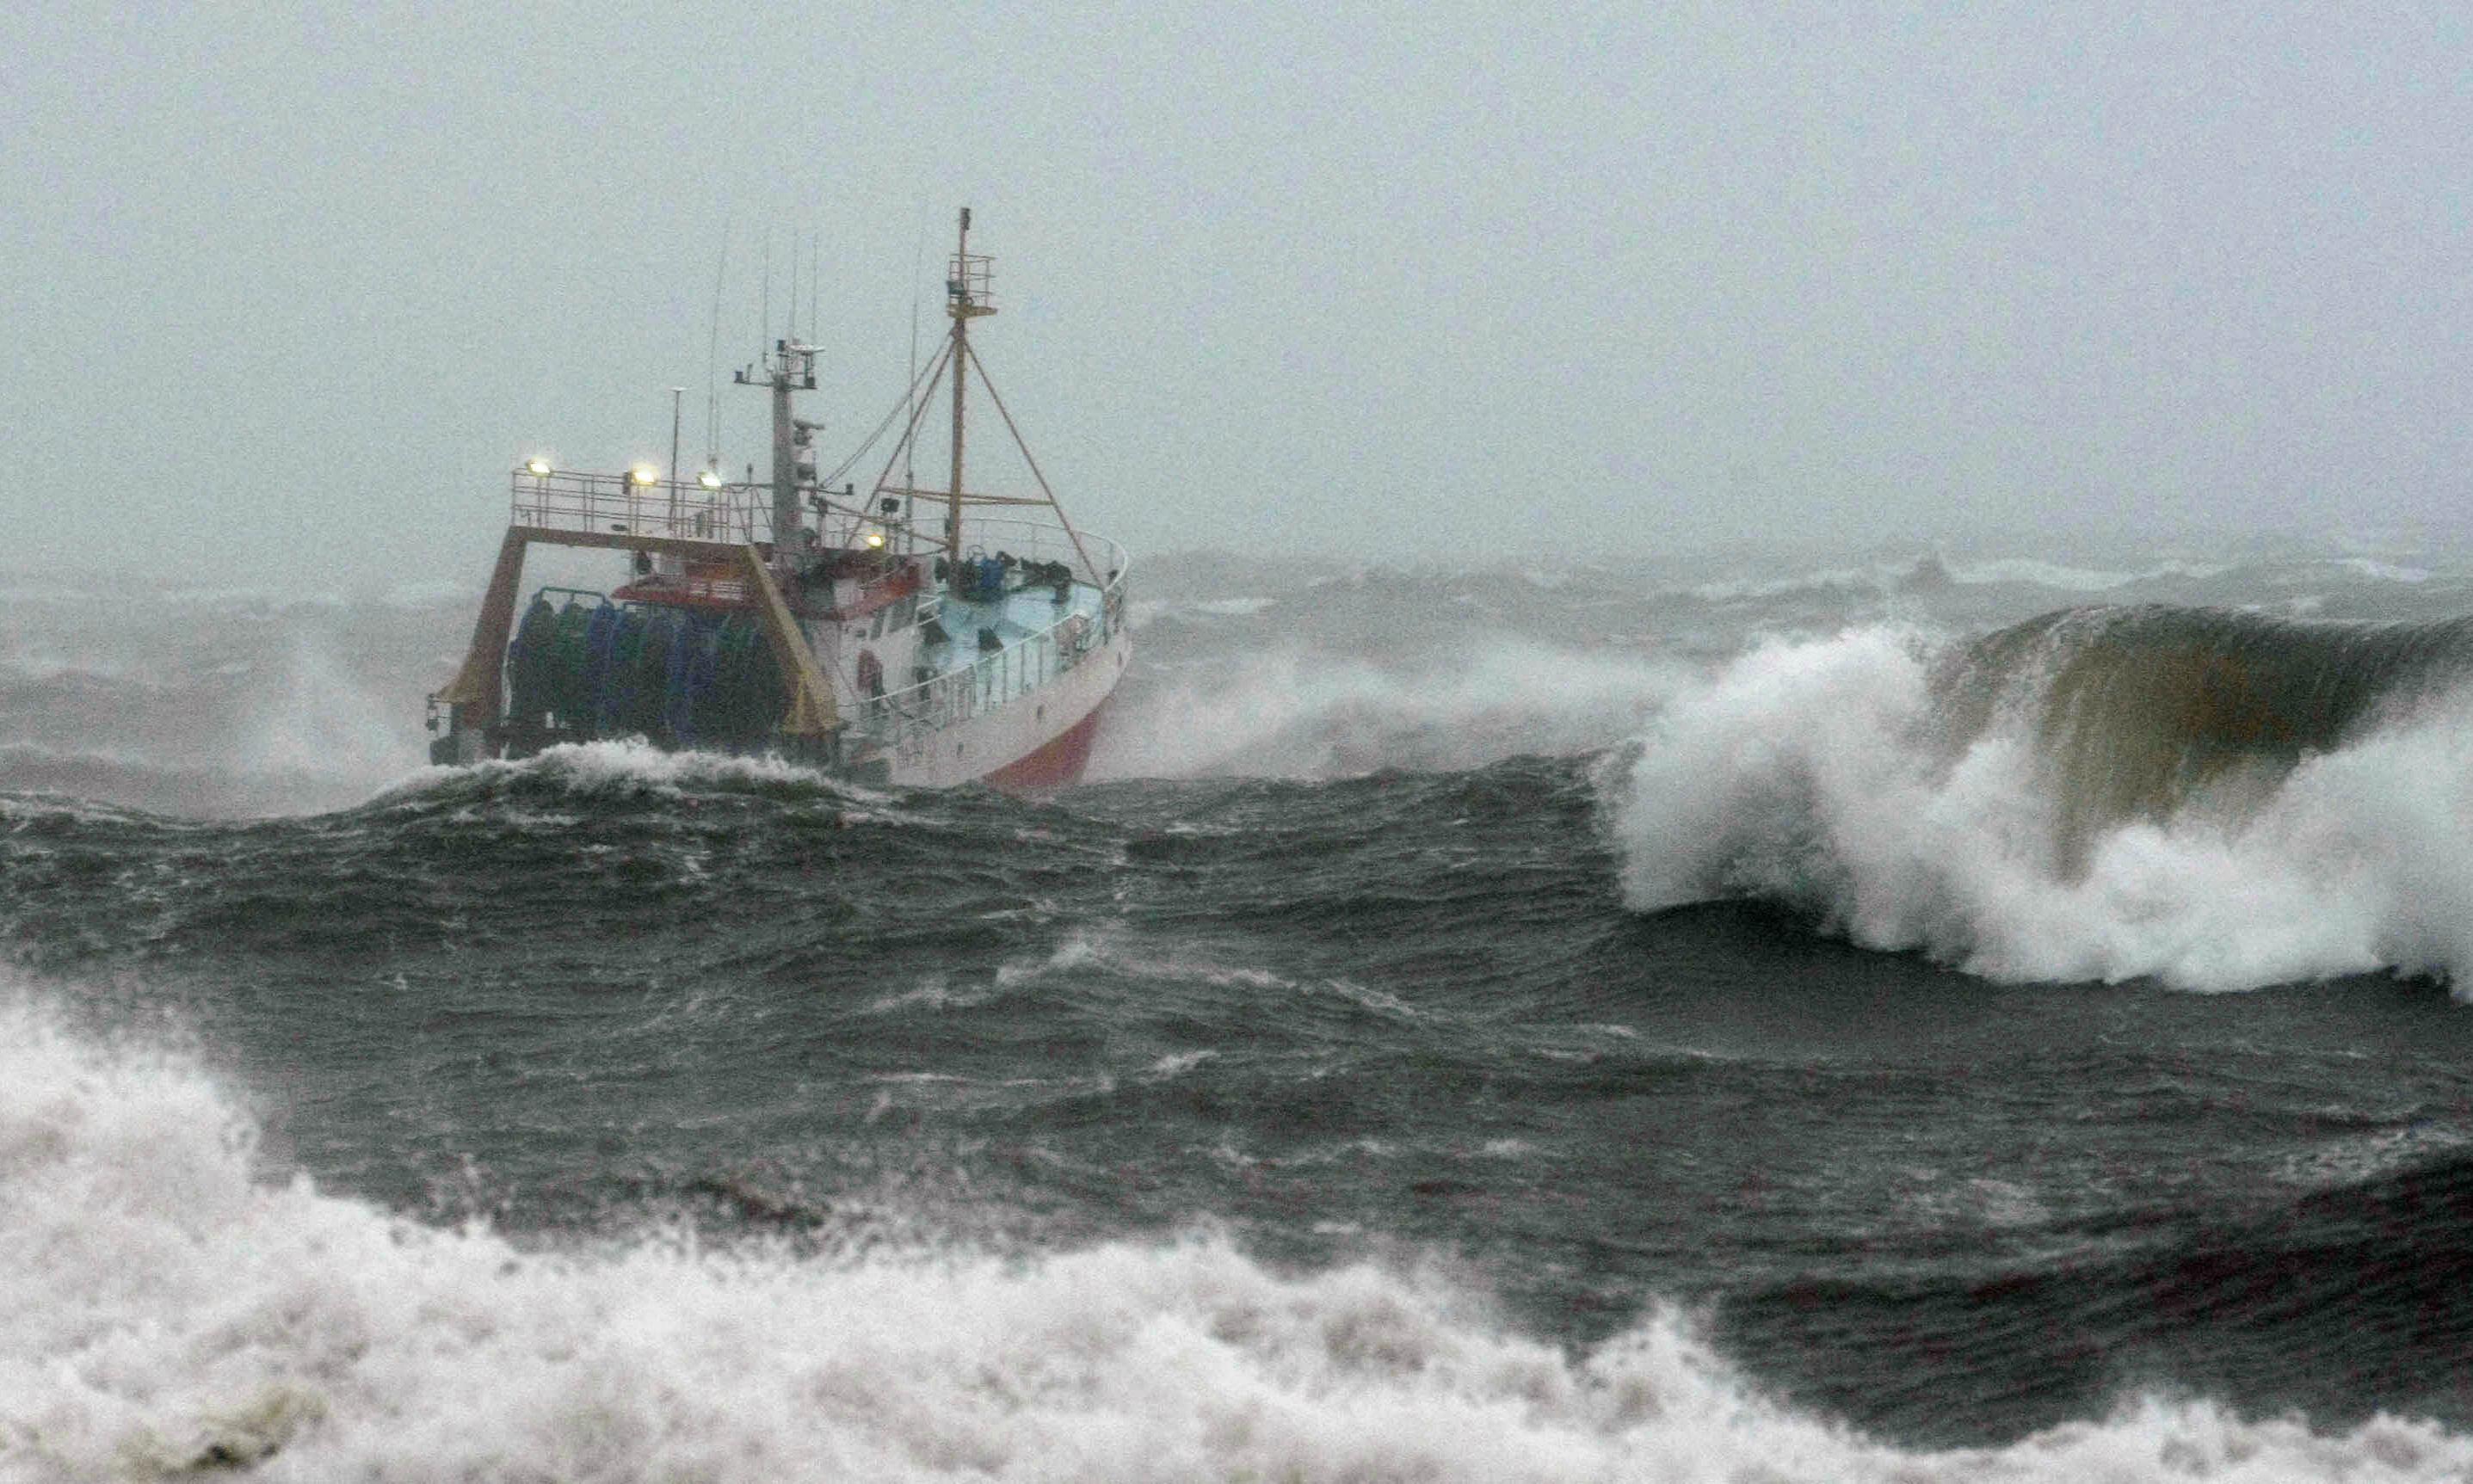 Non-EEA migrants on Irish trawlers gain new immigration rights